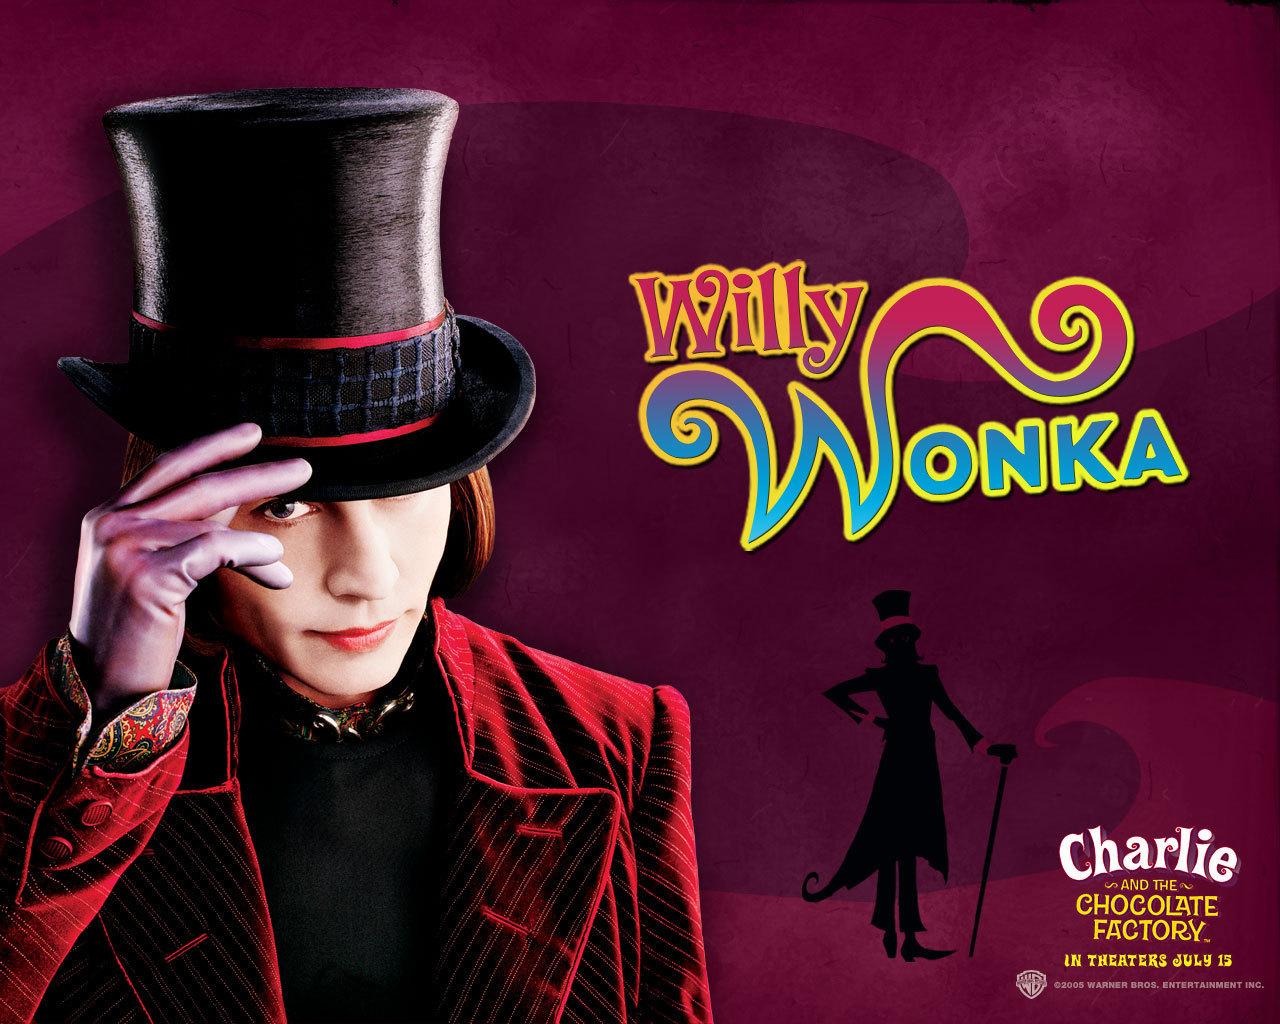 http://1.bp.blogspot.com/-cxhCSRv0OFk/UBFltkbMUkI/AAAAAAAAEao/n_ODBDBUeU8/s1600/Willy-Wonka-johnny-depps-movie-characters-8955323-1280-1024.jpg